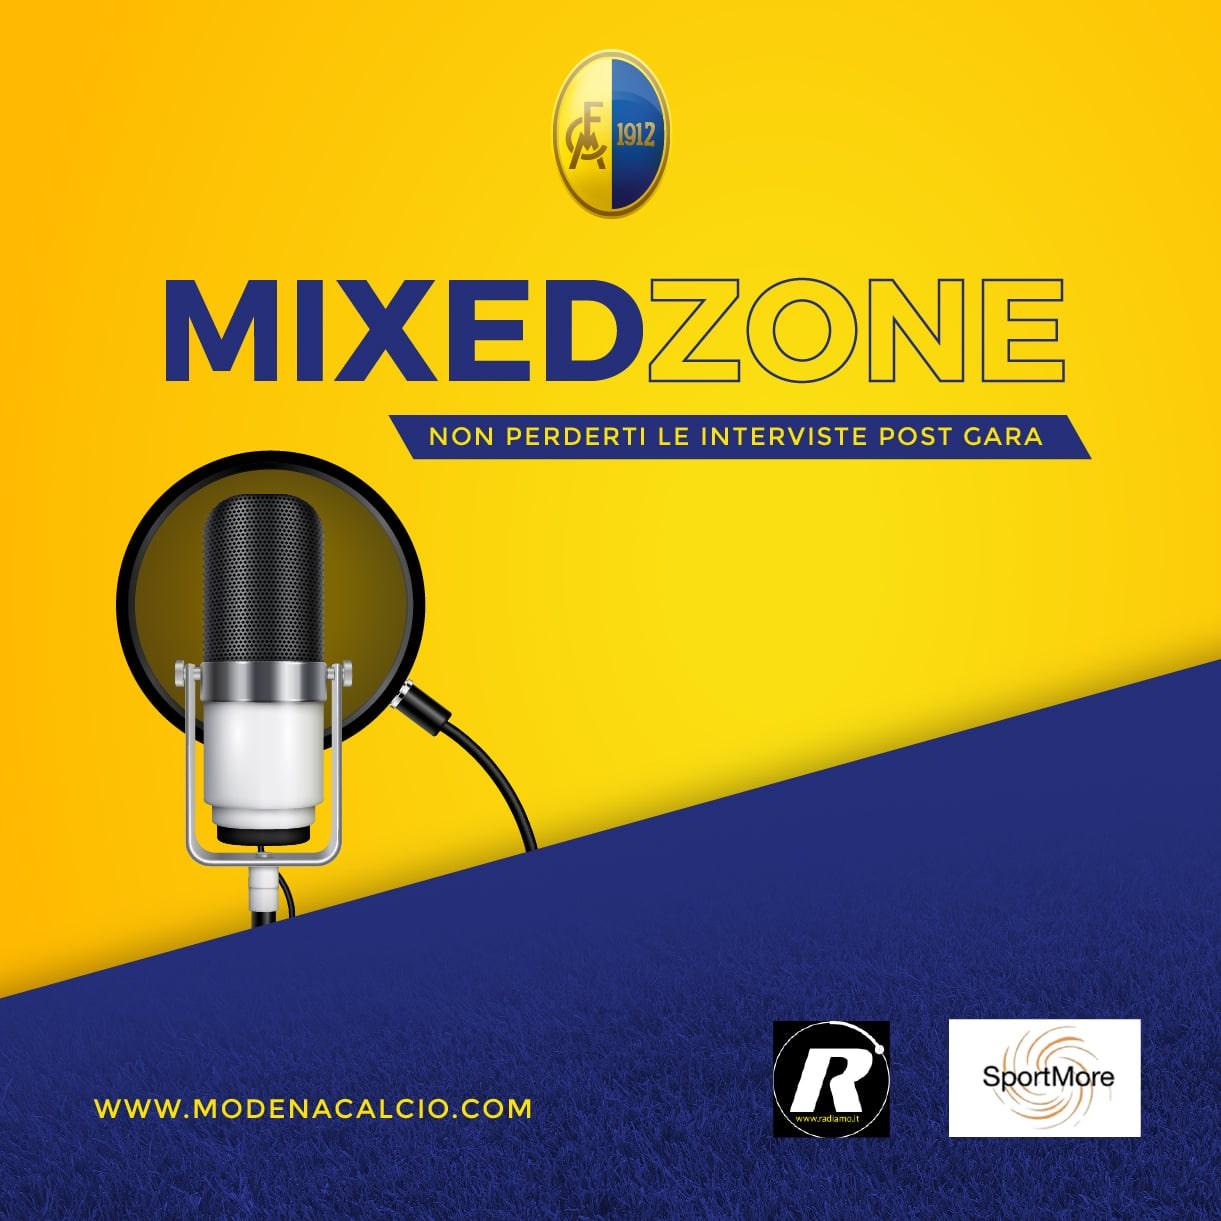 mixedzone